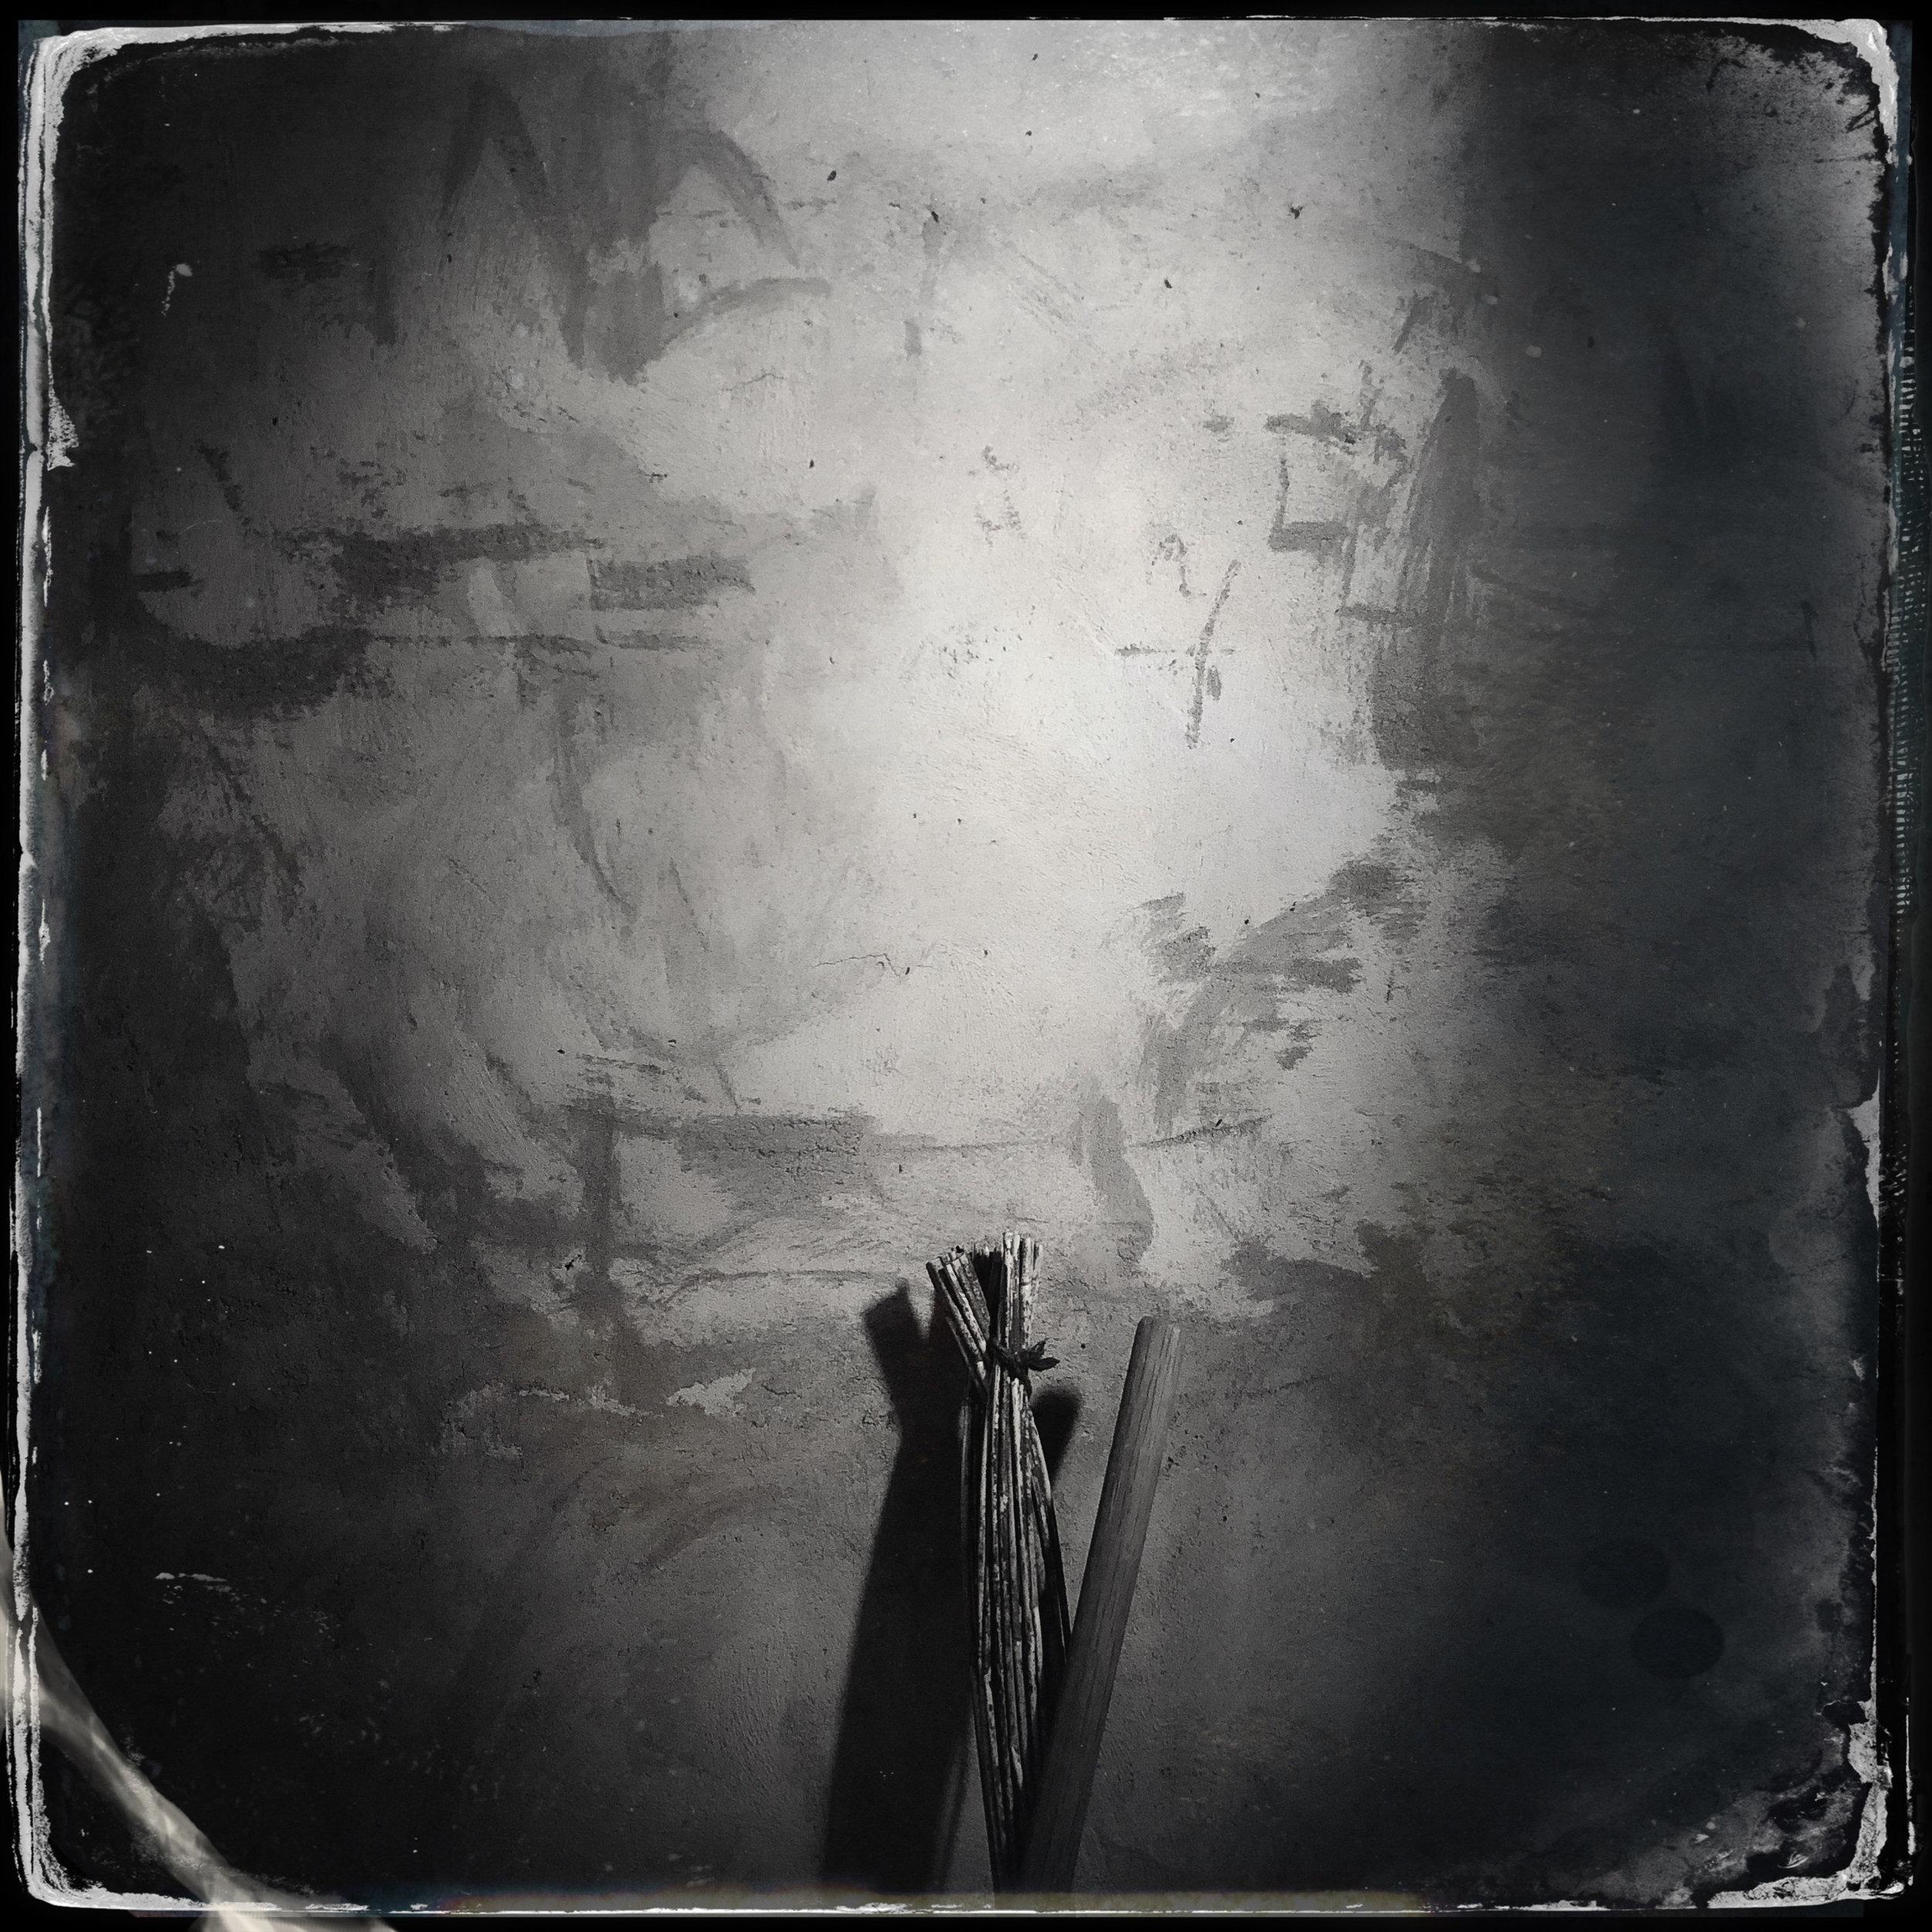 HipstamaticPhoto-575001219.296258.jpg